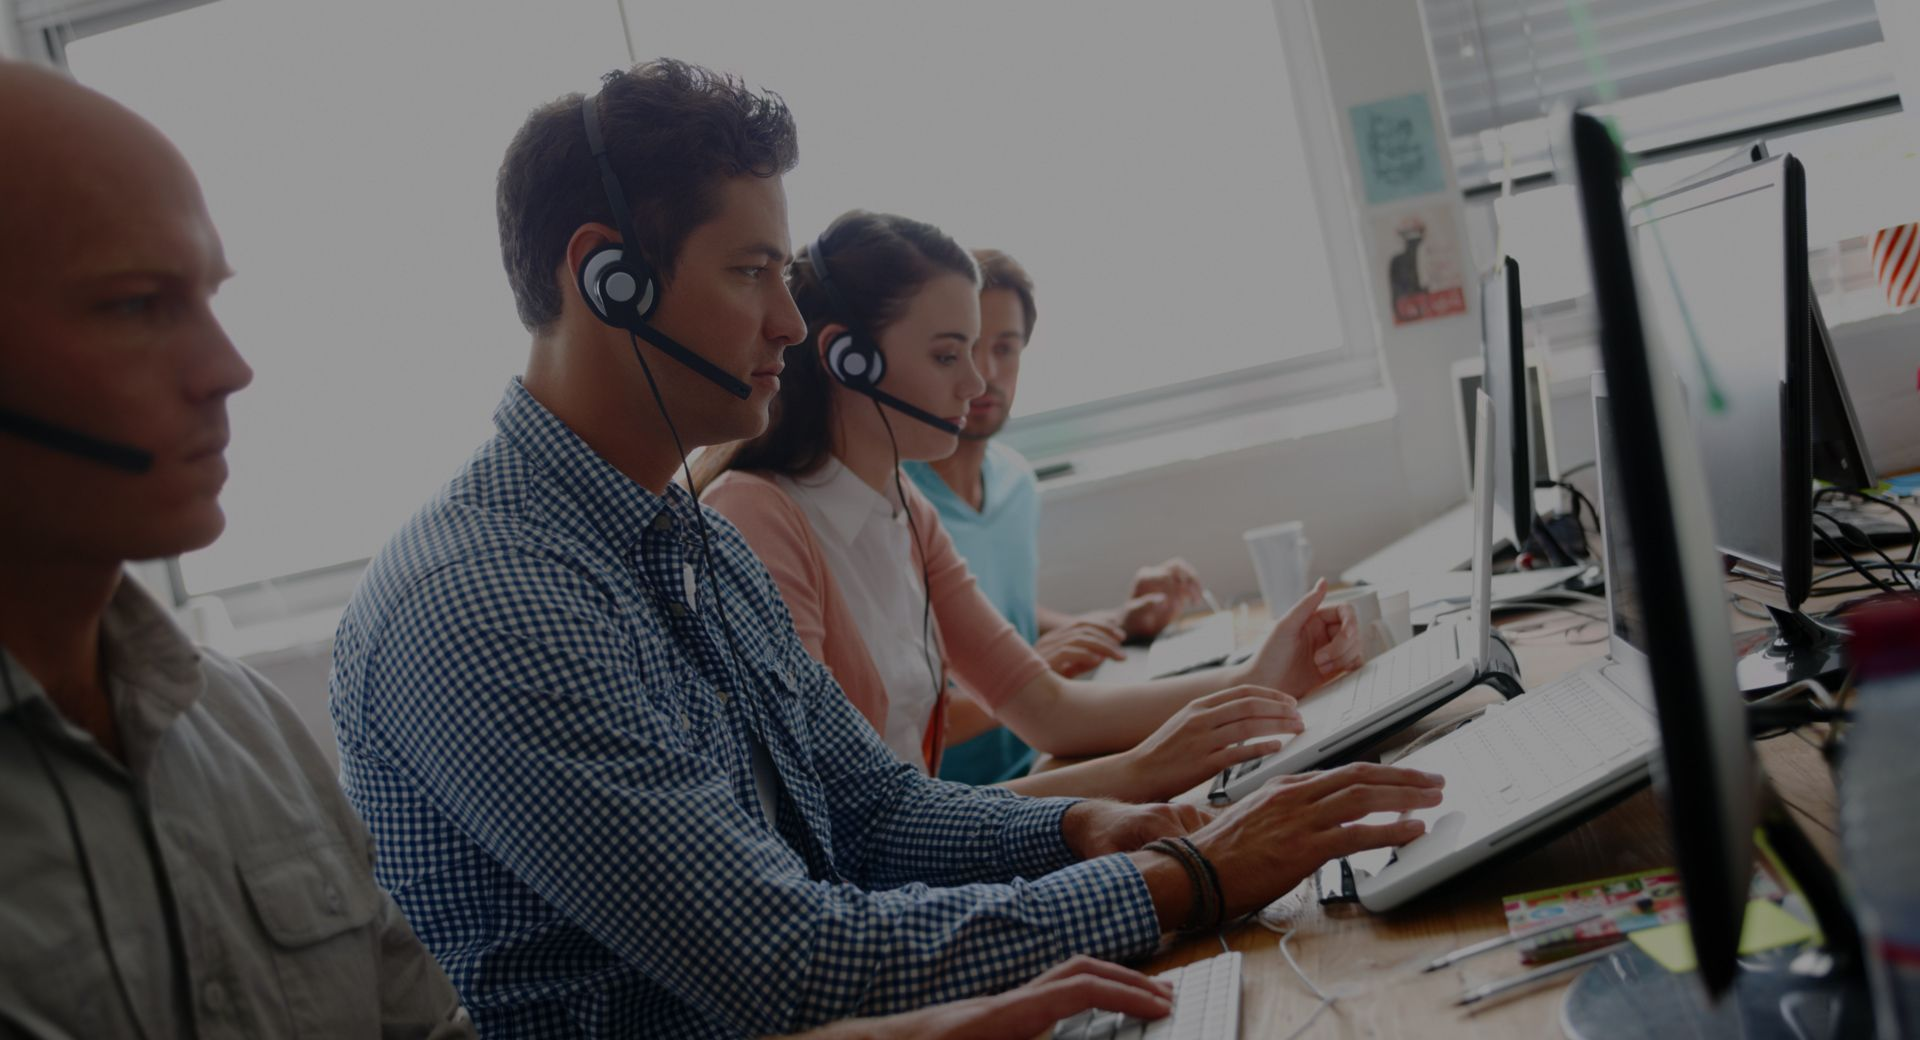 IT Managed Services Help Desk